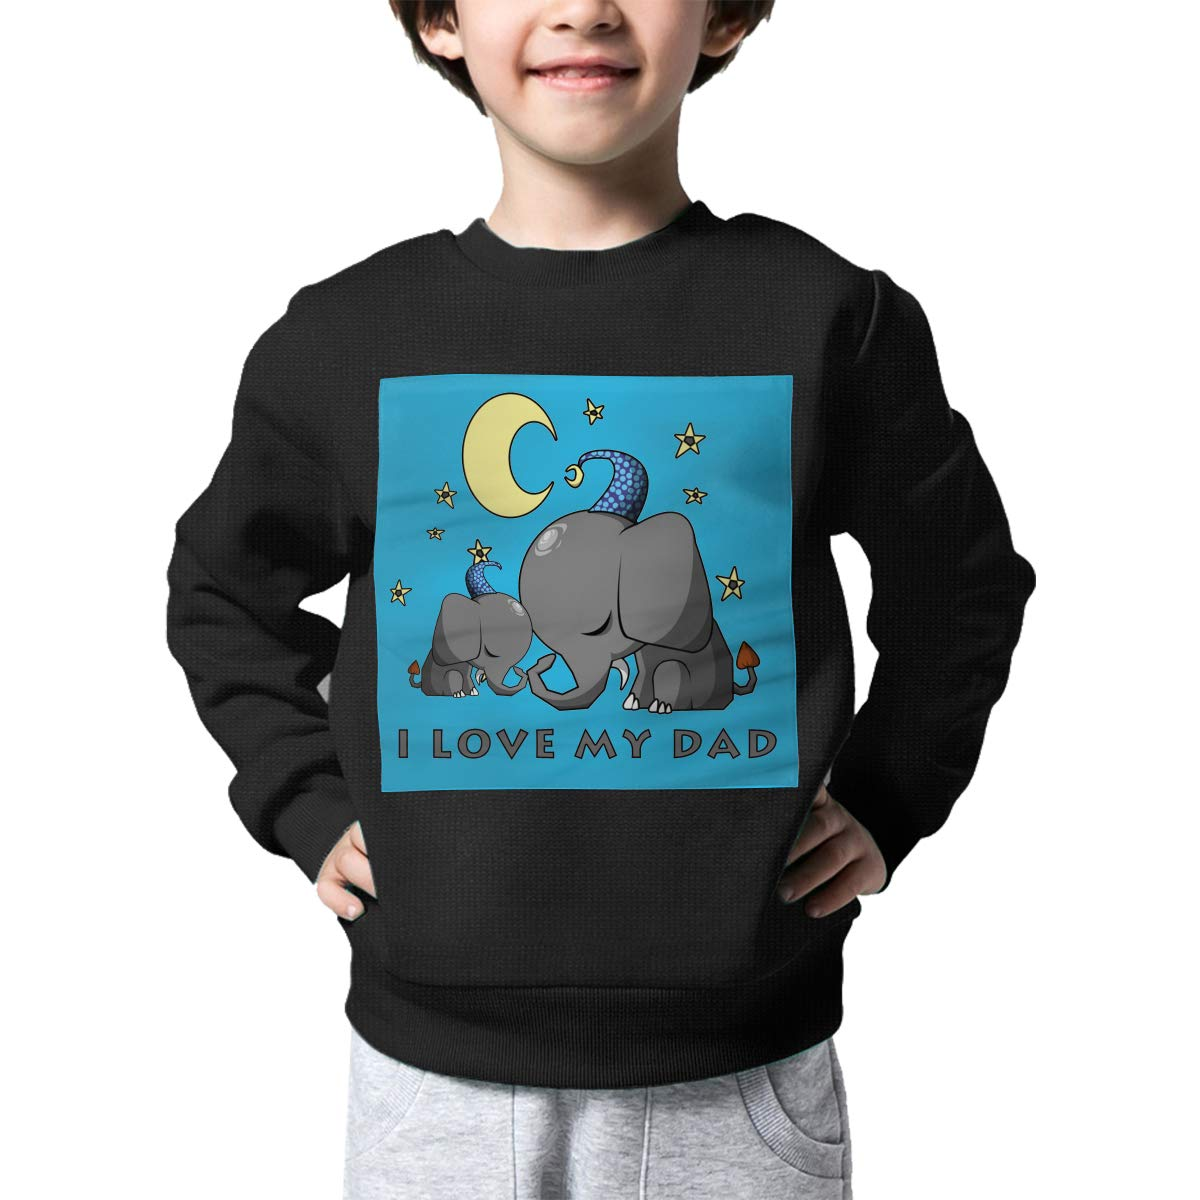 Rainbowhug Elephant I Love My Dad Kids Sweater Ugly Warm Sweater Toddler for Girls Boys